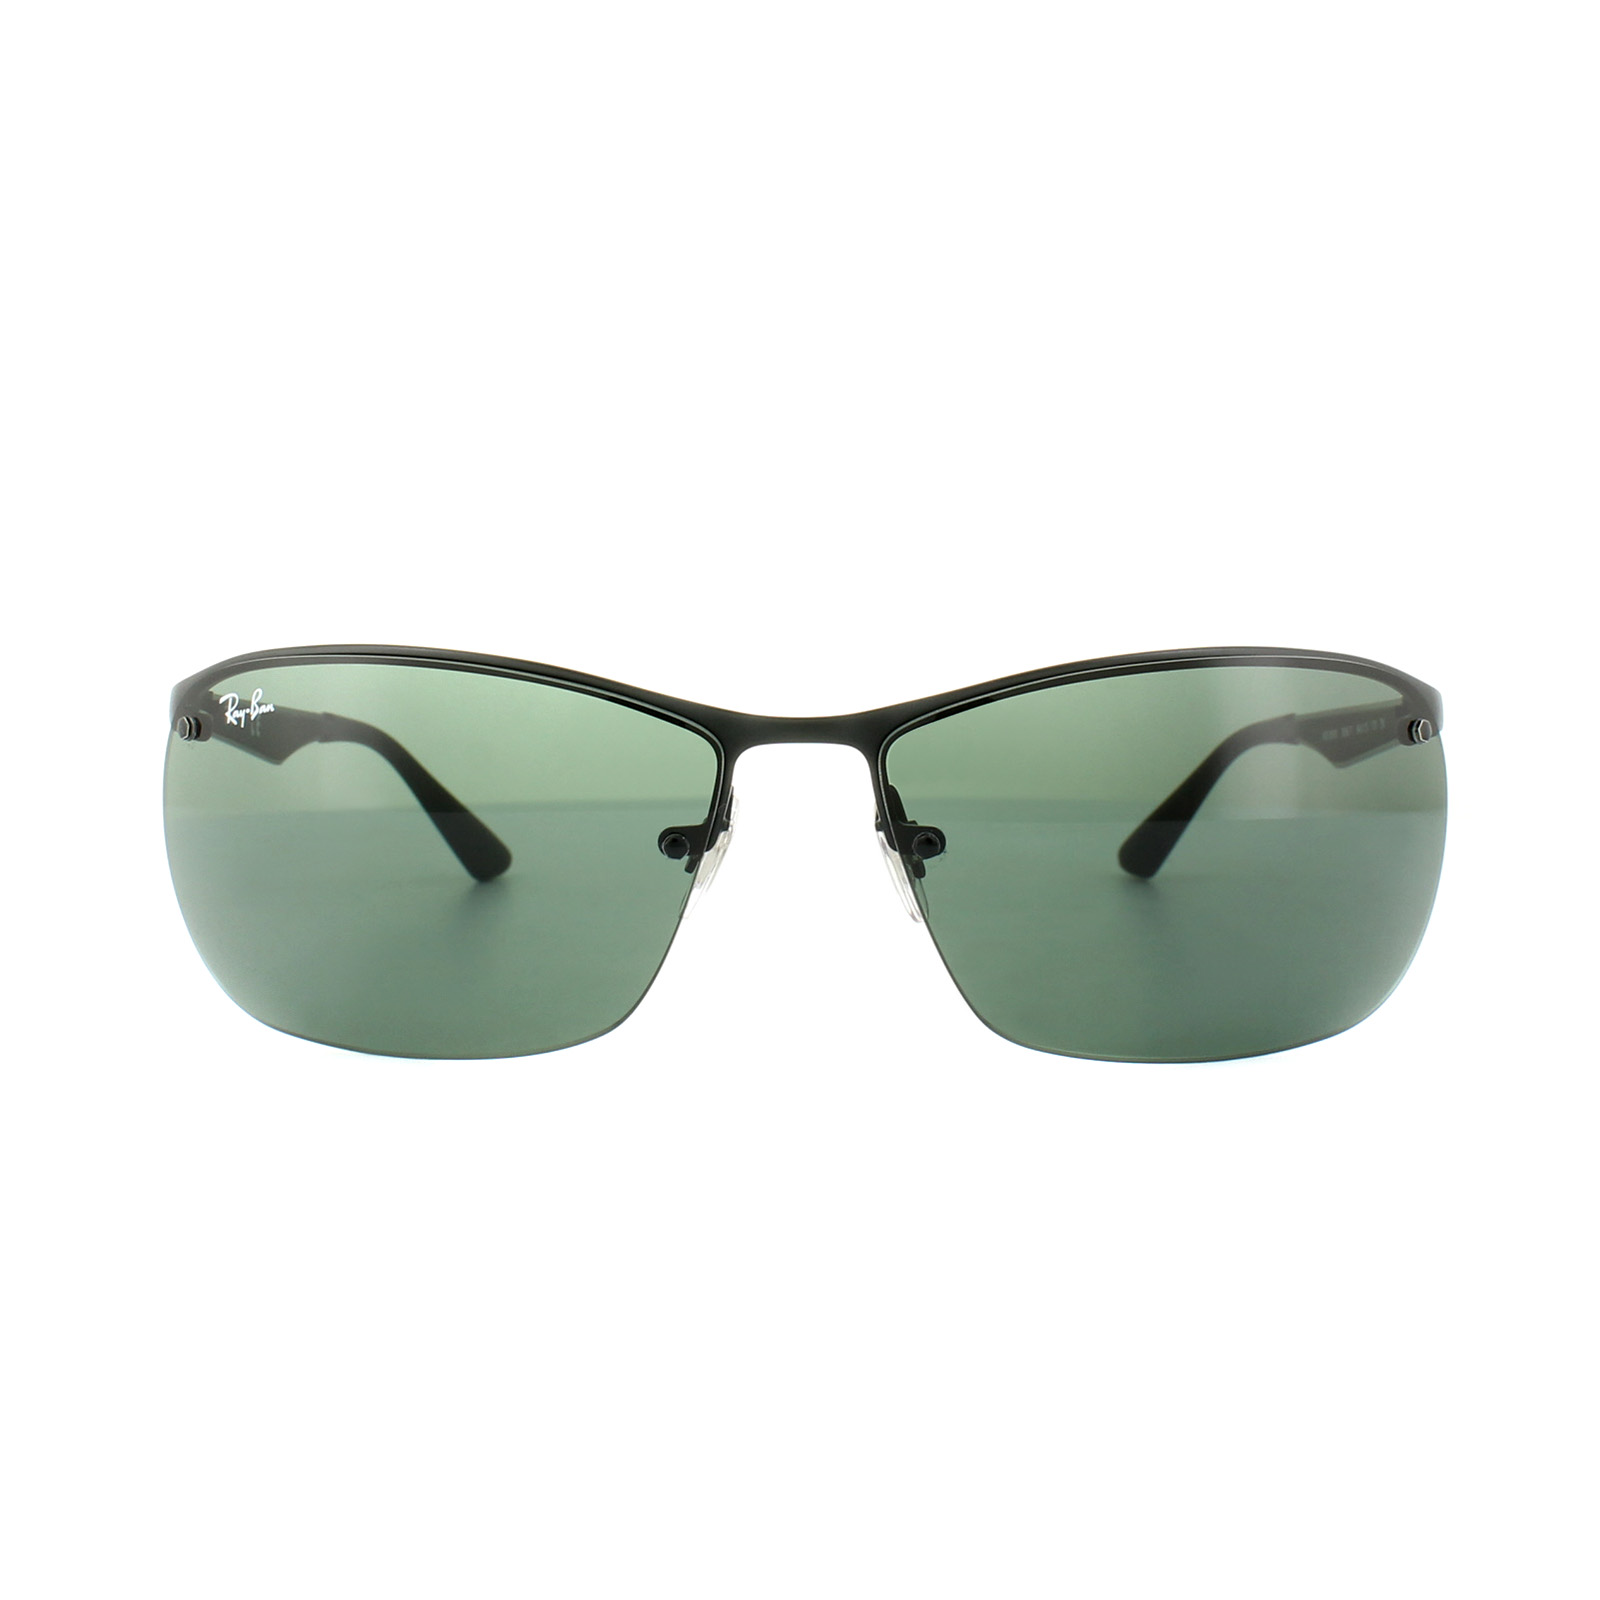 fdd0bcce60 Ray-Ban Sunglasses 3550 006 71 Black Green G-15 8053672633733